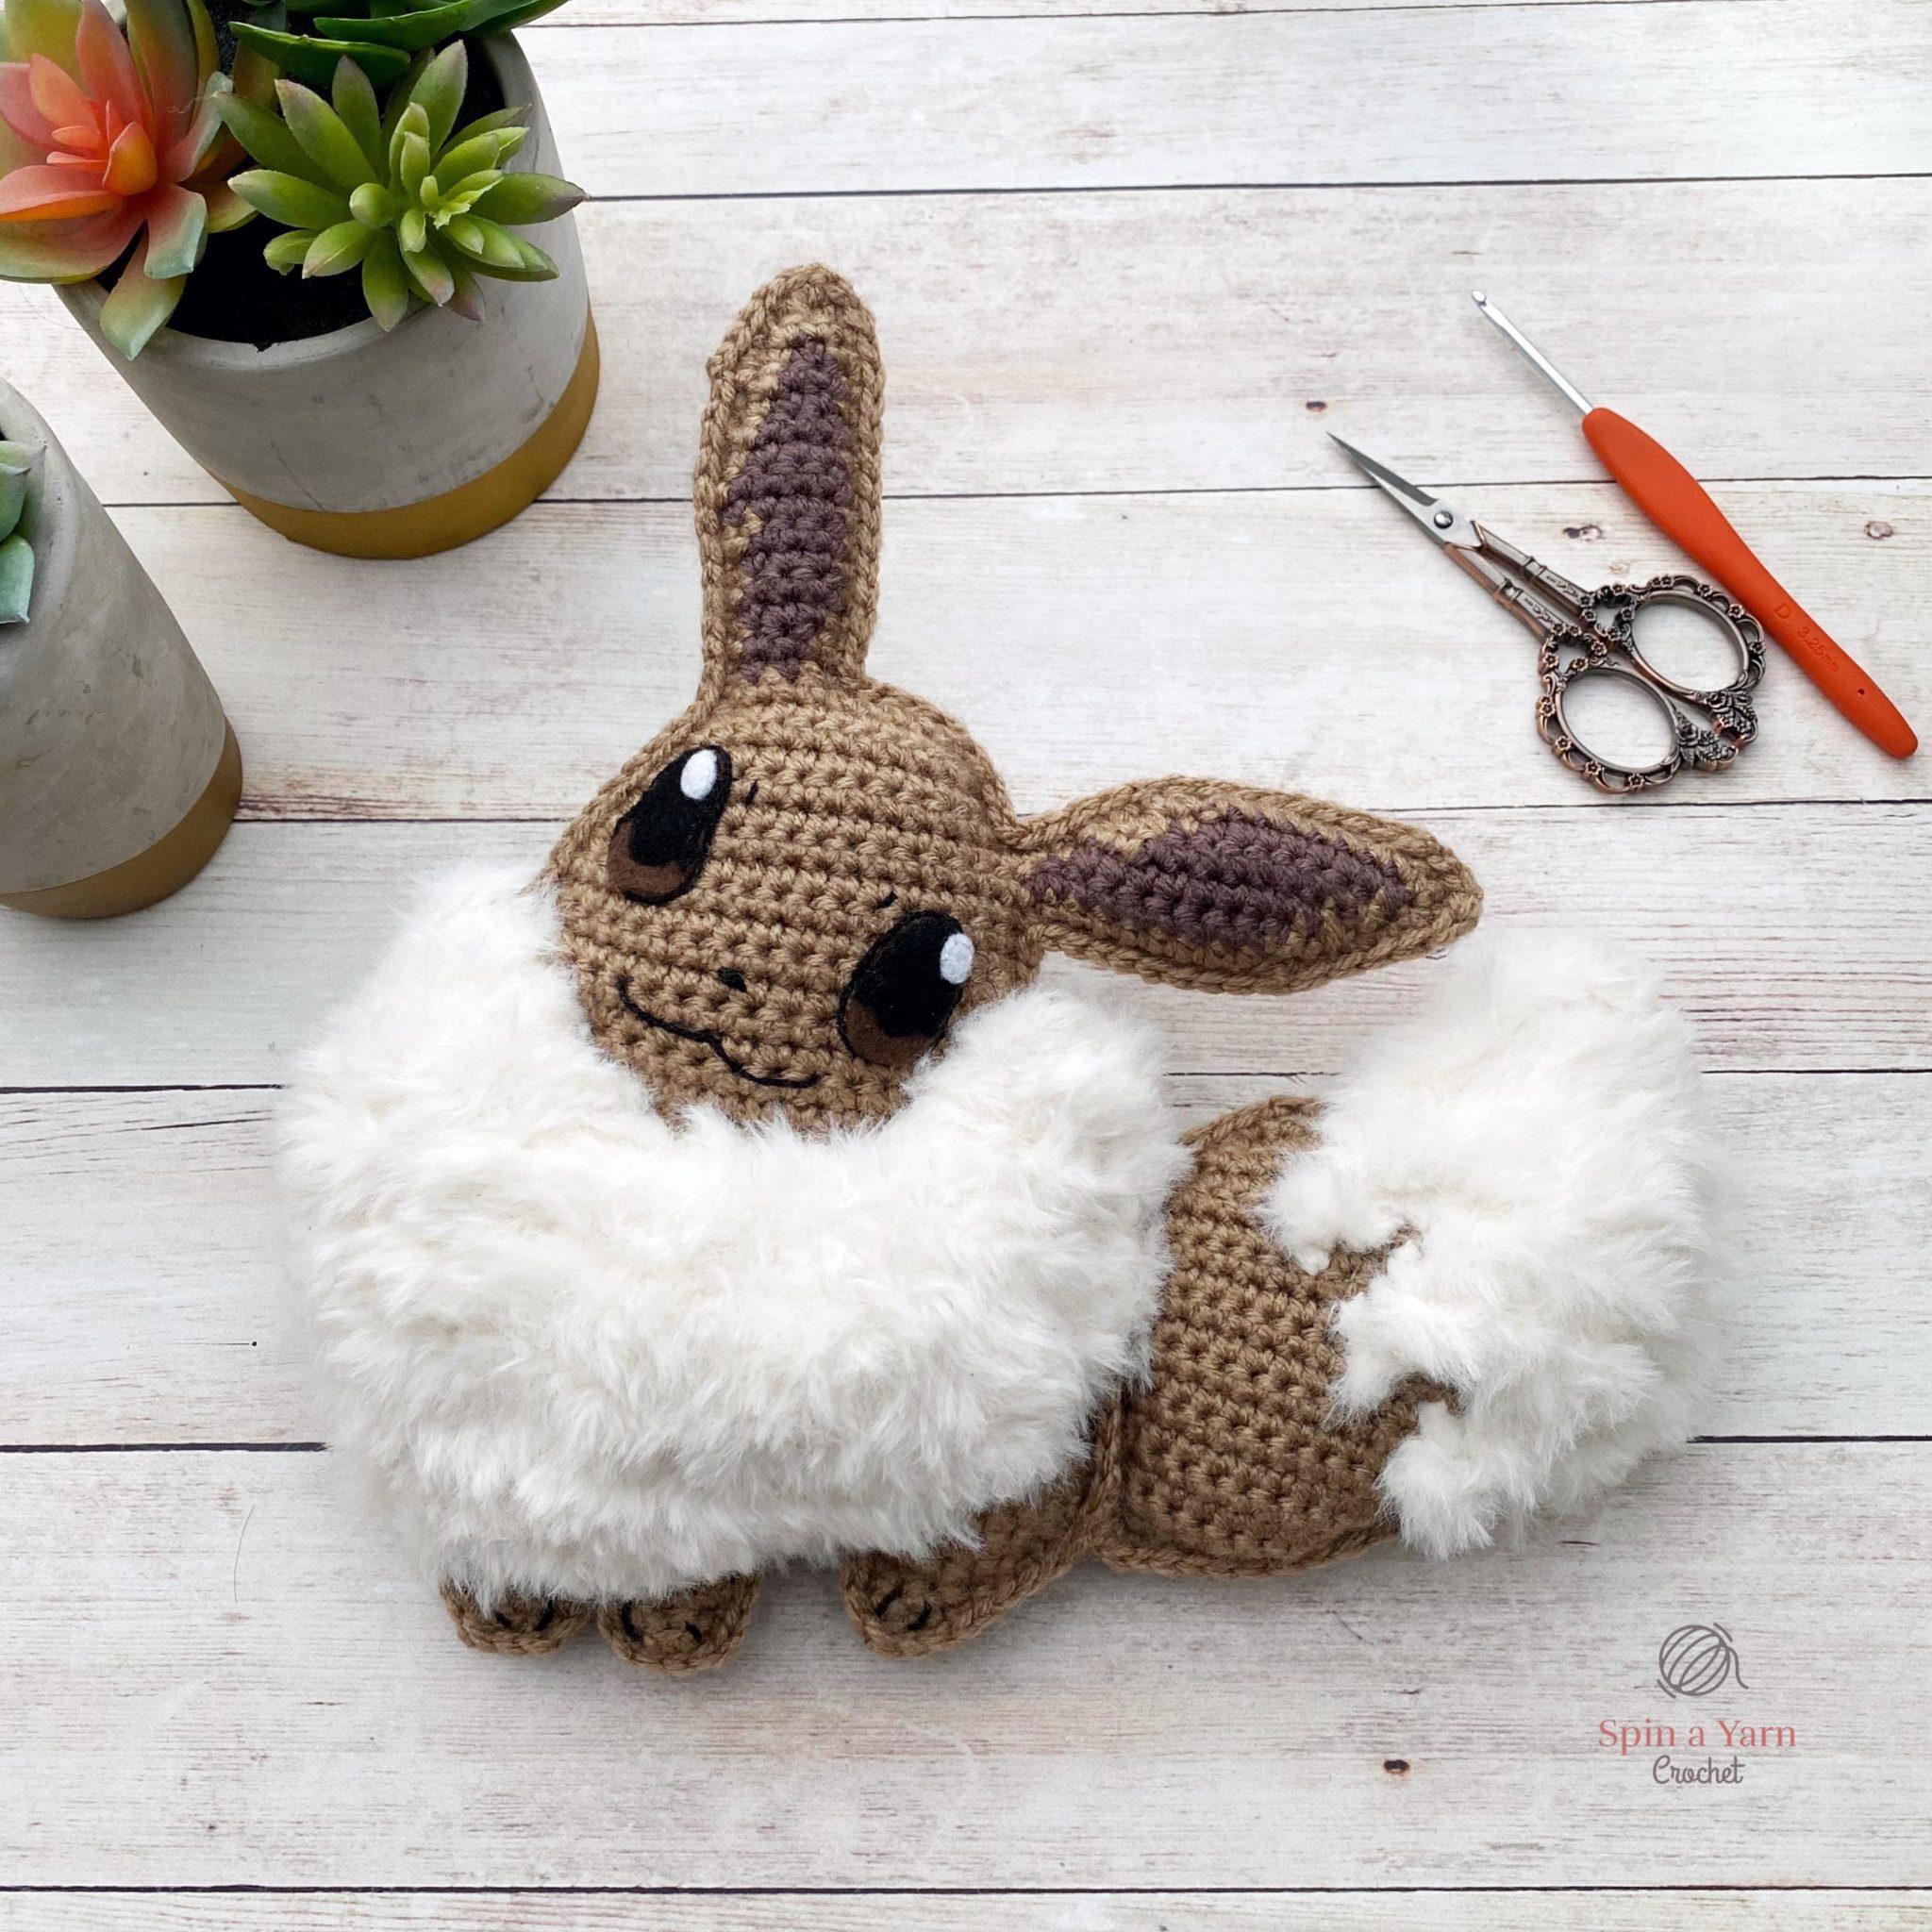 Free Totoro Crochet Patterns: All 3 Spirits from My Neighbor Totoro! | | 2048x2048